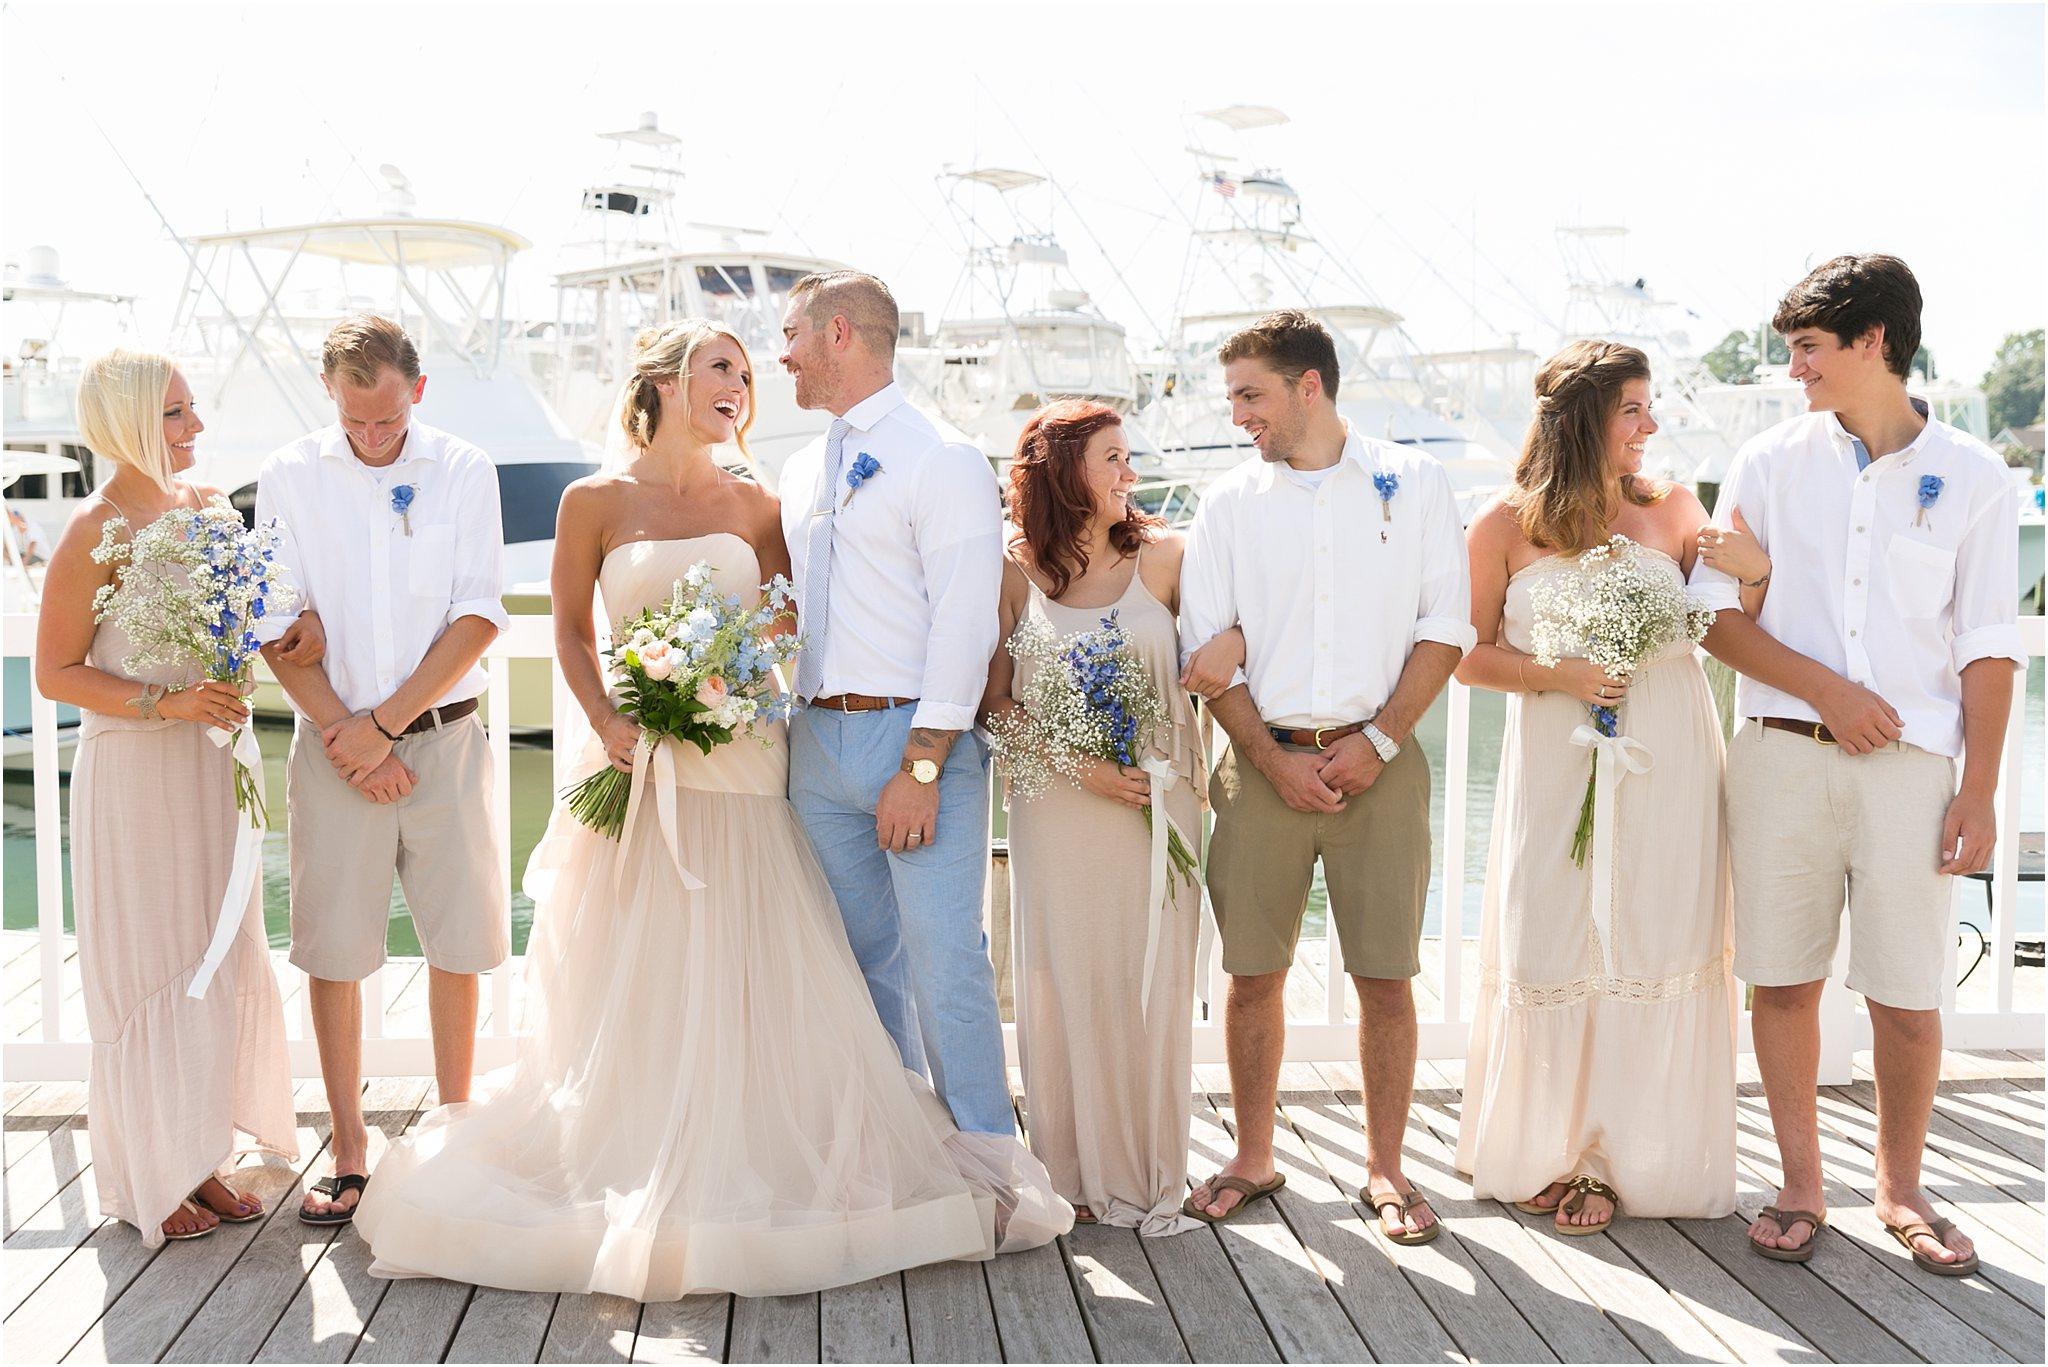 jessica_ryan_photography_virginia_beach_water_tabe_wedding_vera_wang_wedding_dress_0614